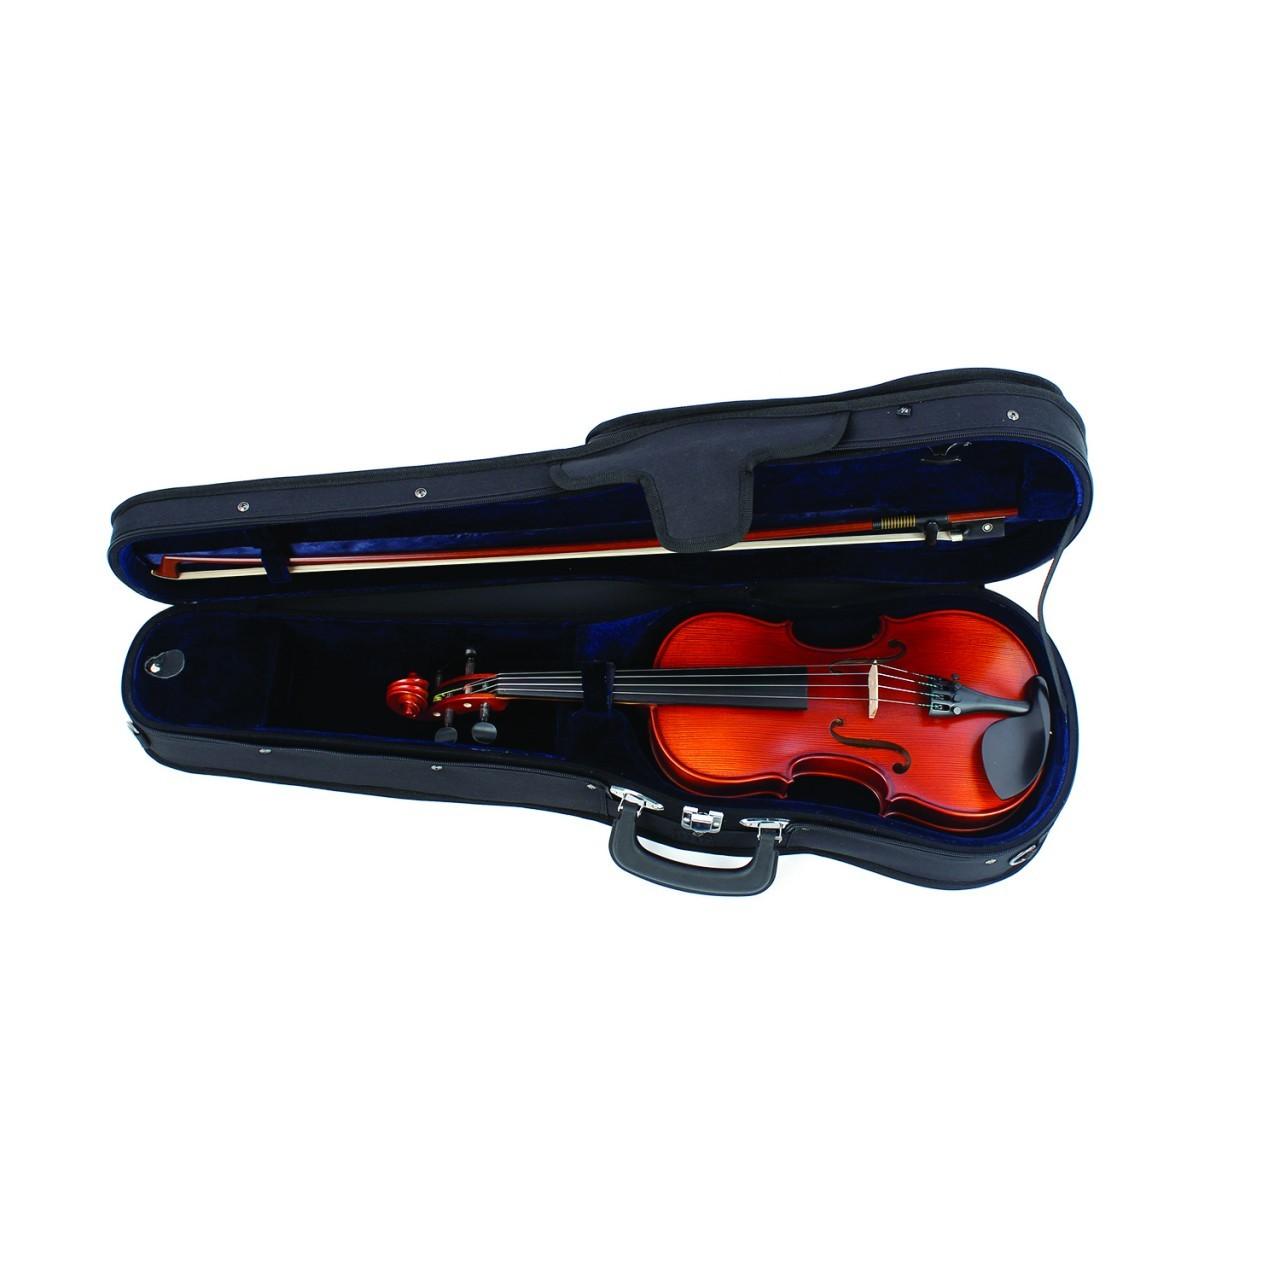 Höfner Violingarnitur II 1/4 golden handlackiert mit Etui + Bogen